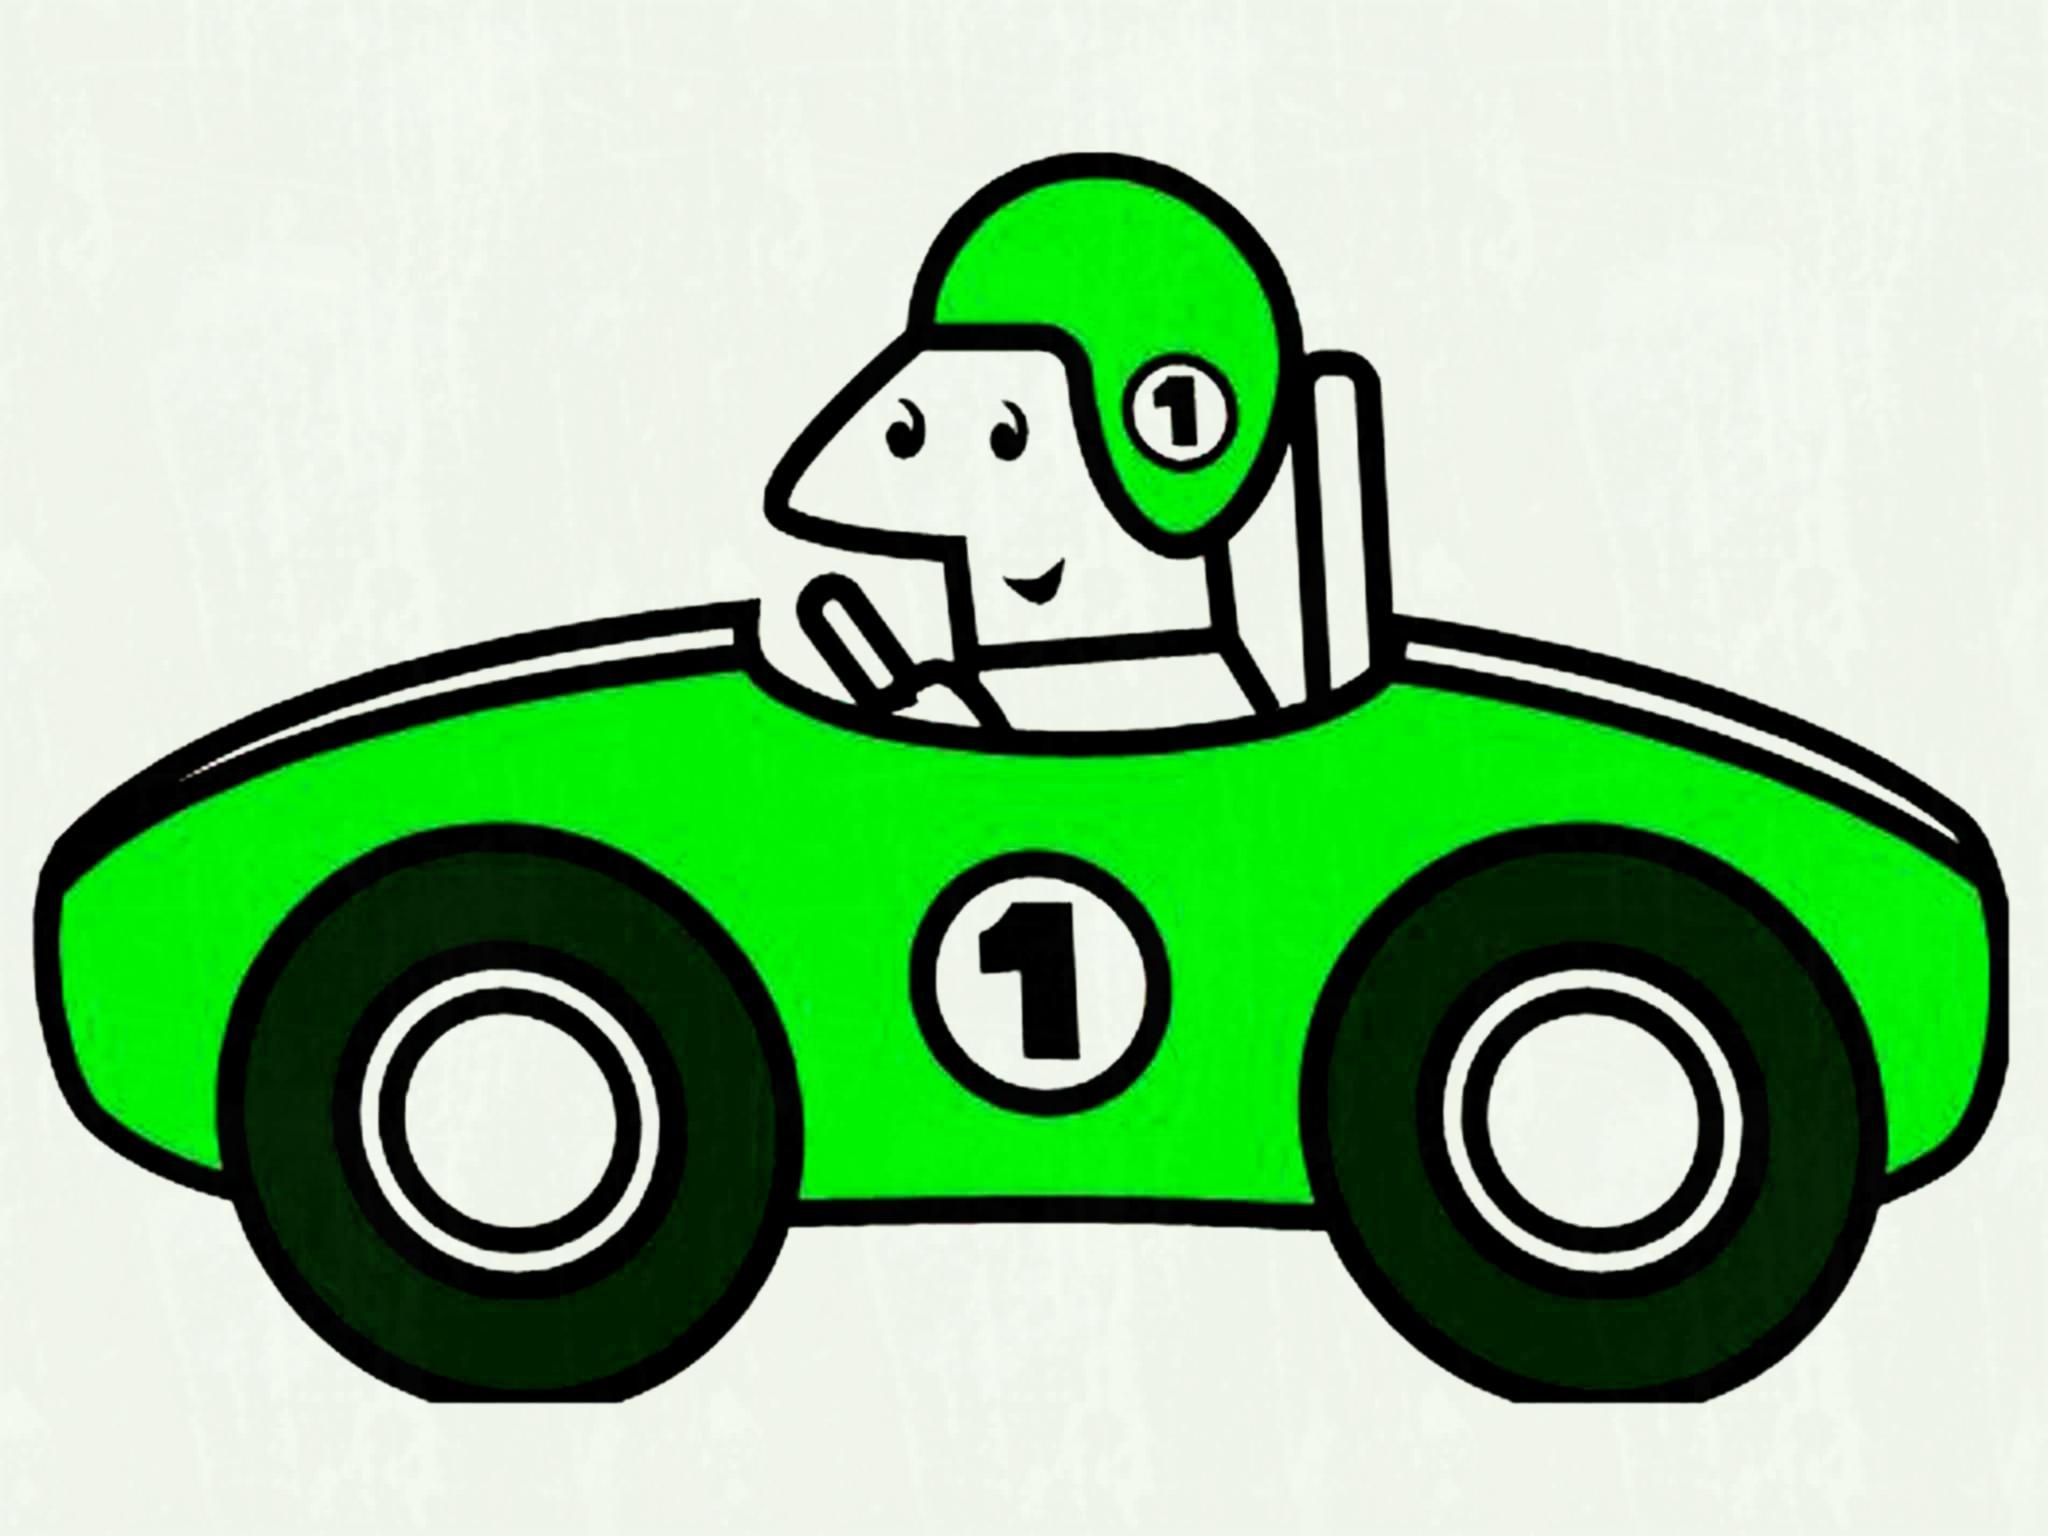 2048x1536 Black And White Sports Car Clipart Auto Logos Clip Art Royalty